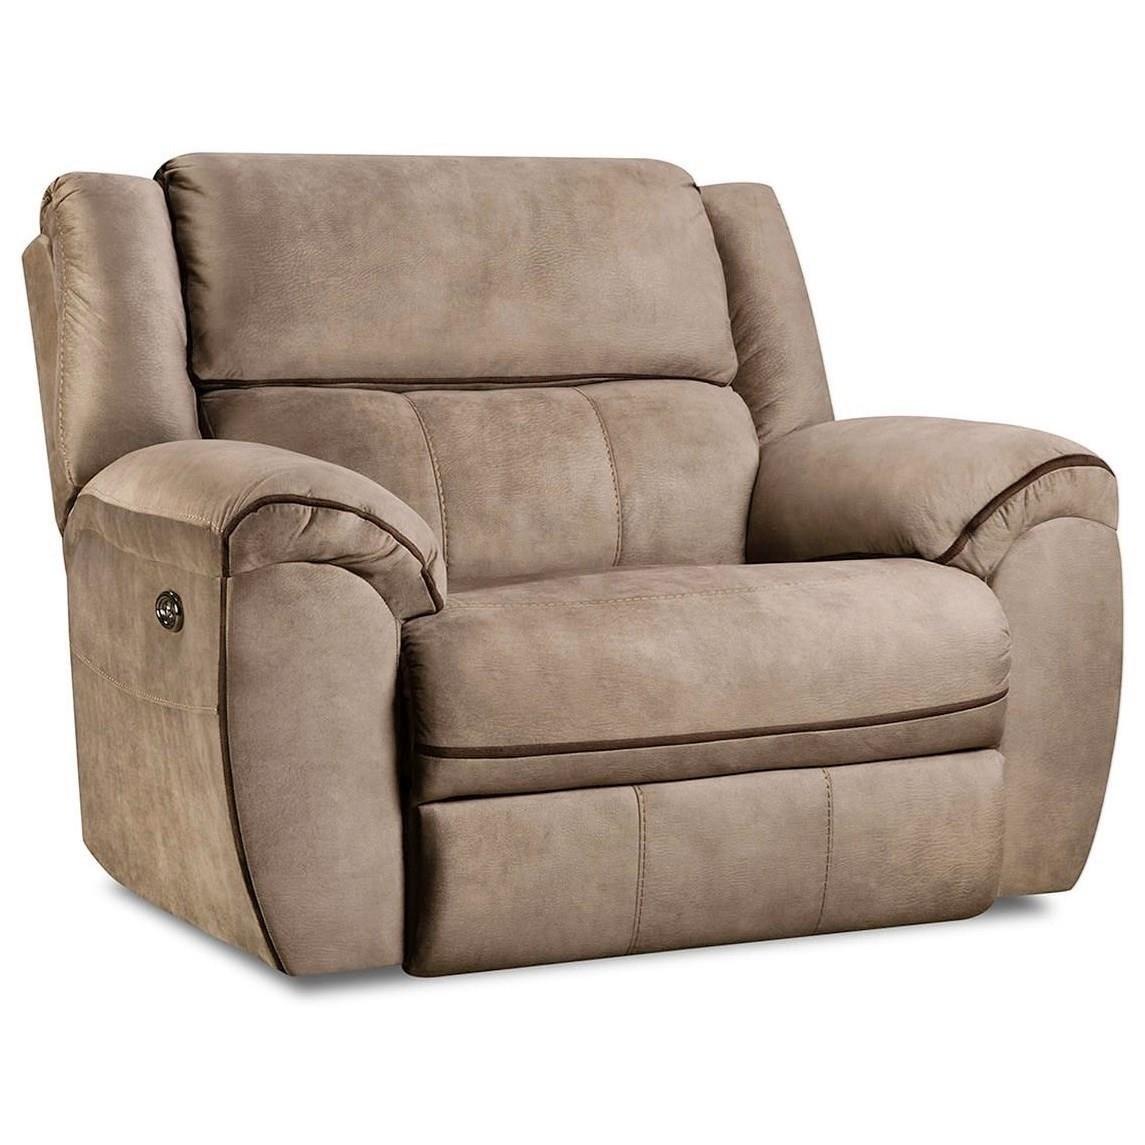 50436BR Cuddler Recliner by United Furniture Industries at Bullard Furniture